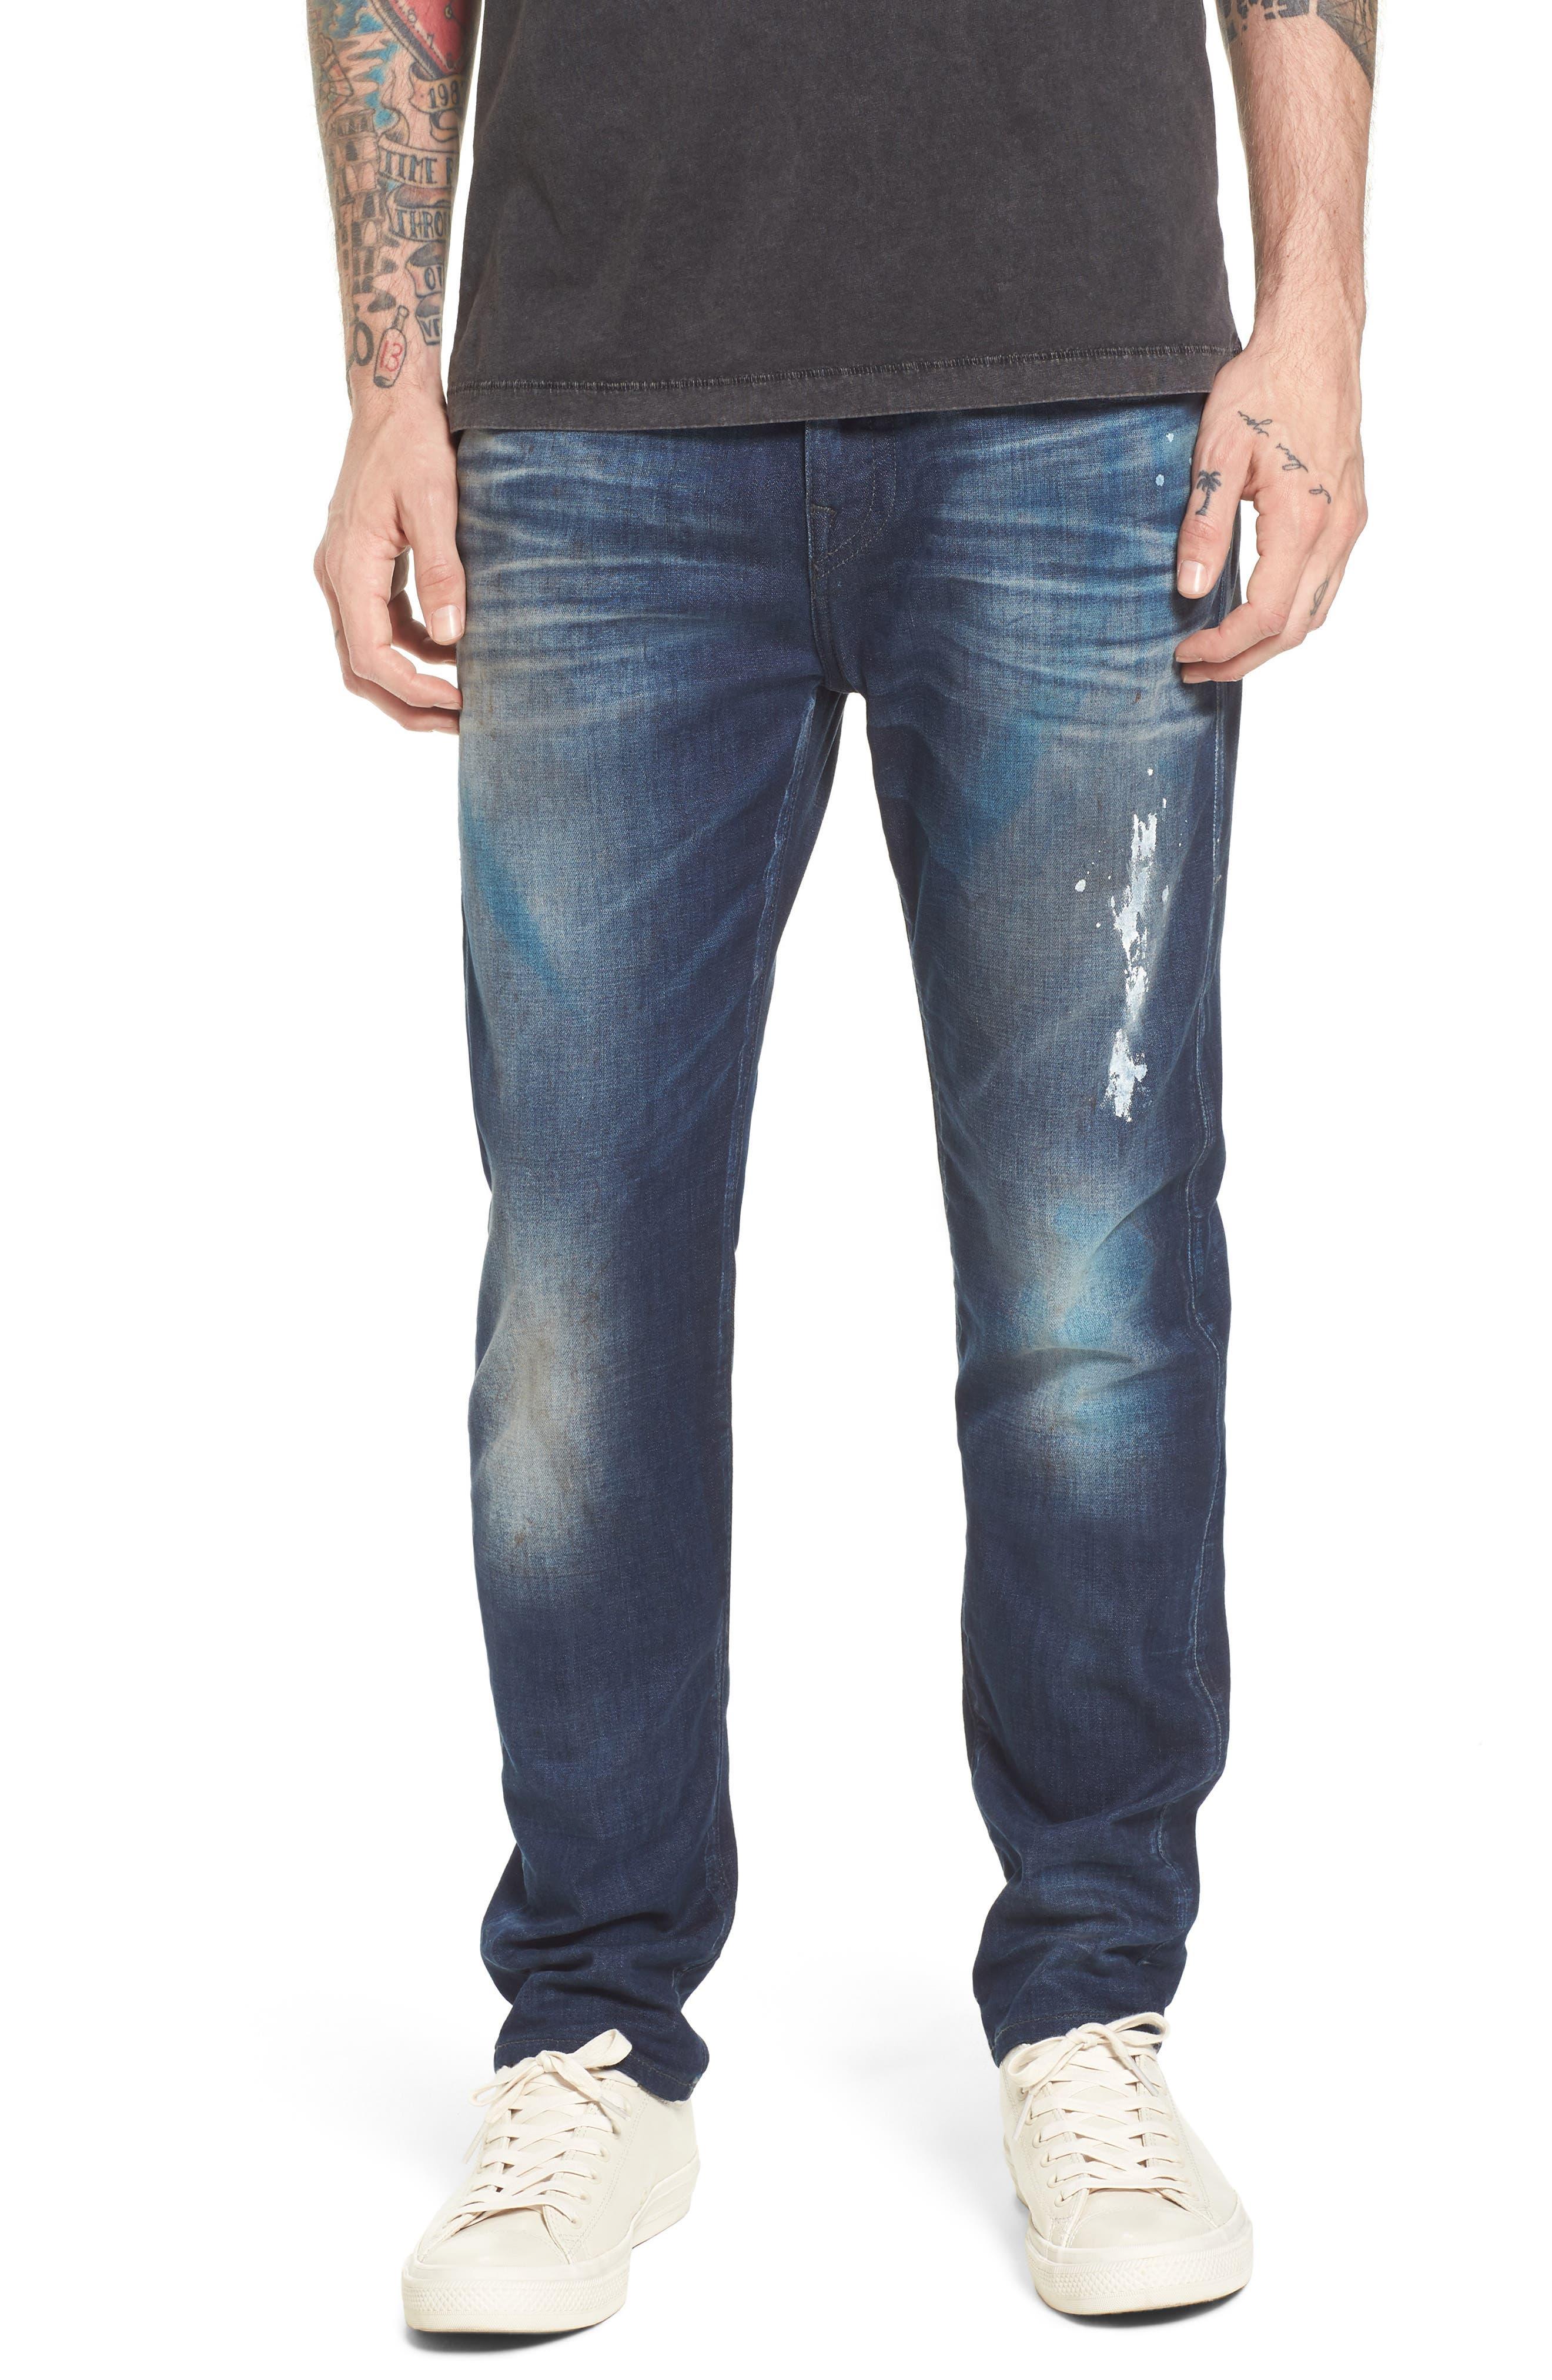 Rocco Skinny Fit Jeans,                             Main thumbnail 1, color,                             Loft Edge